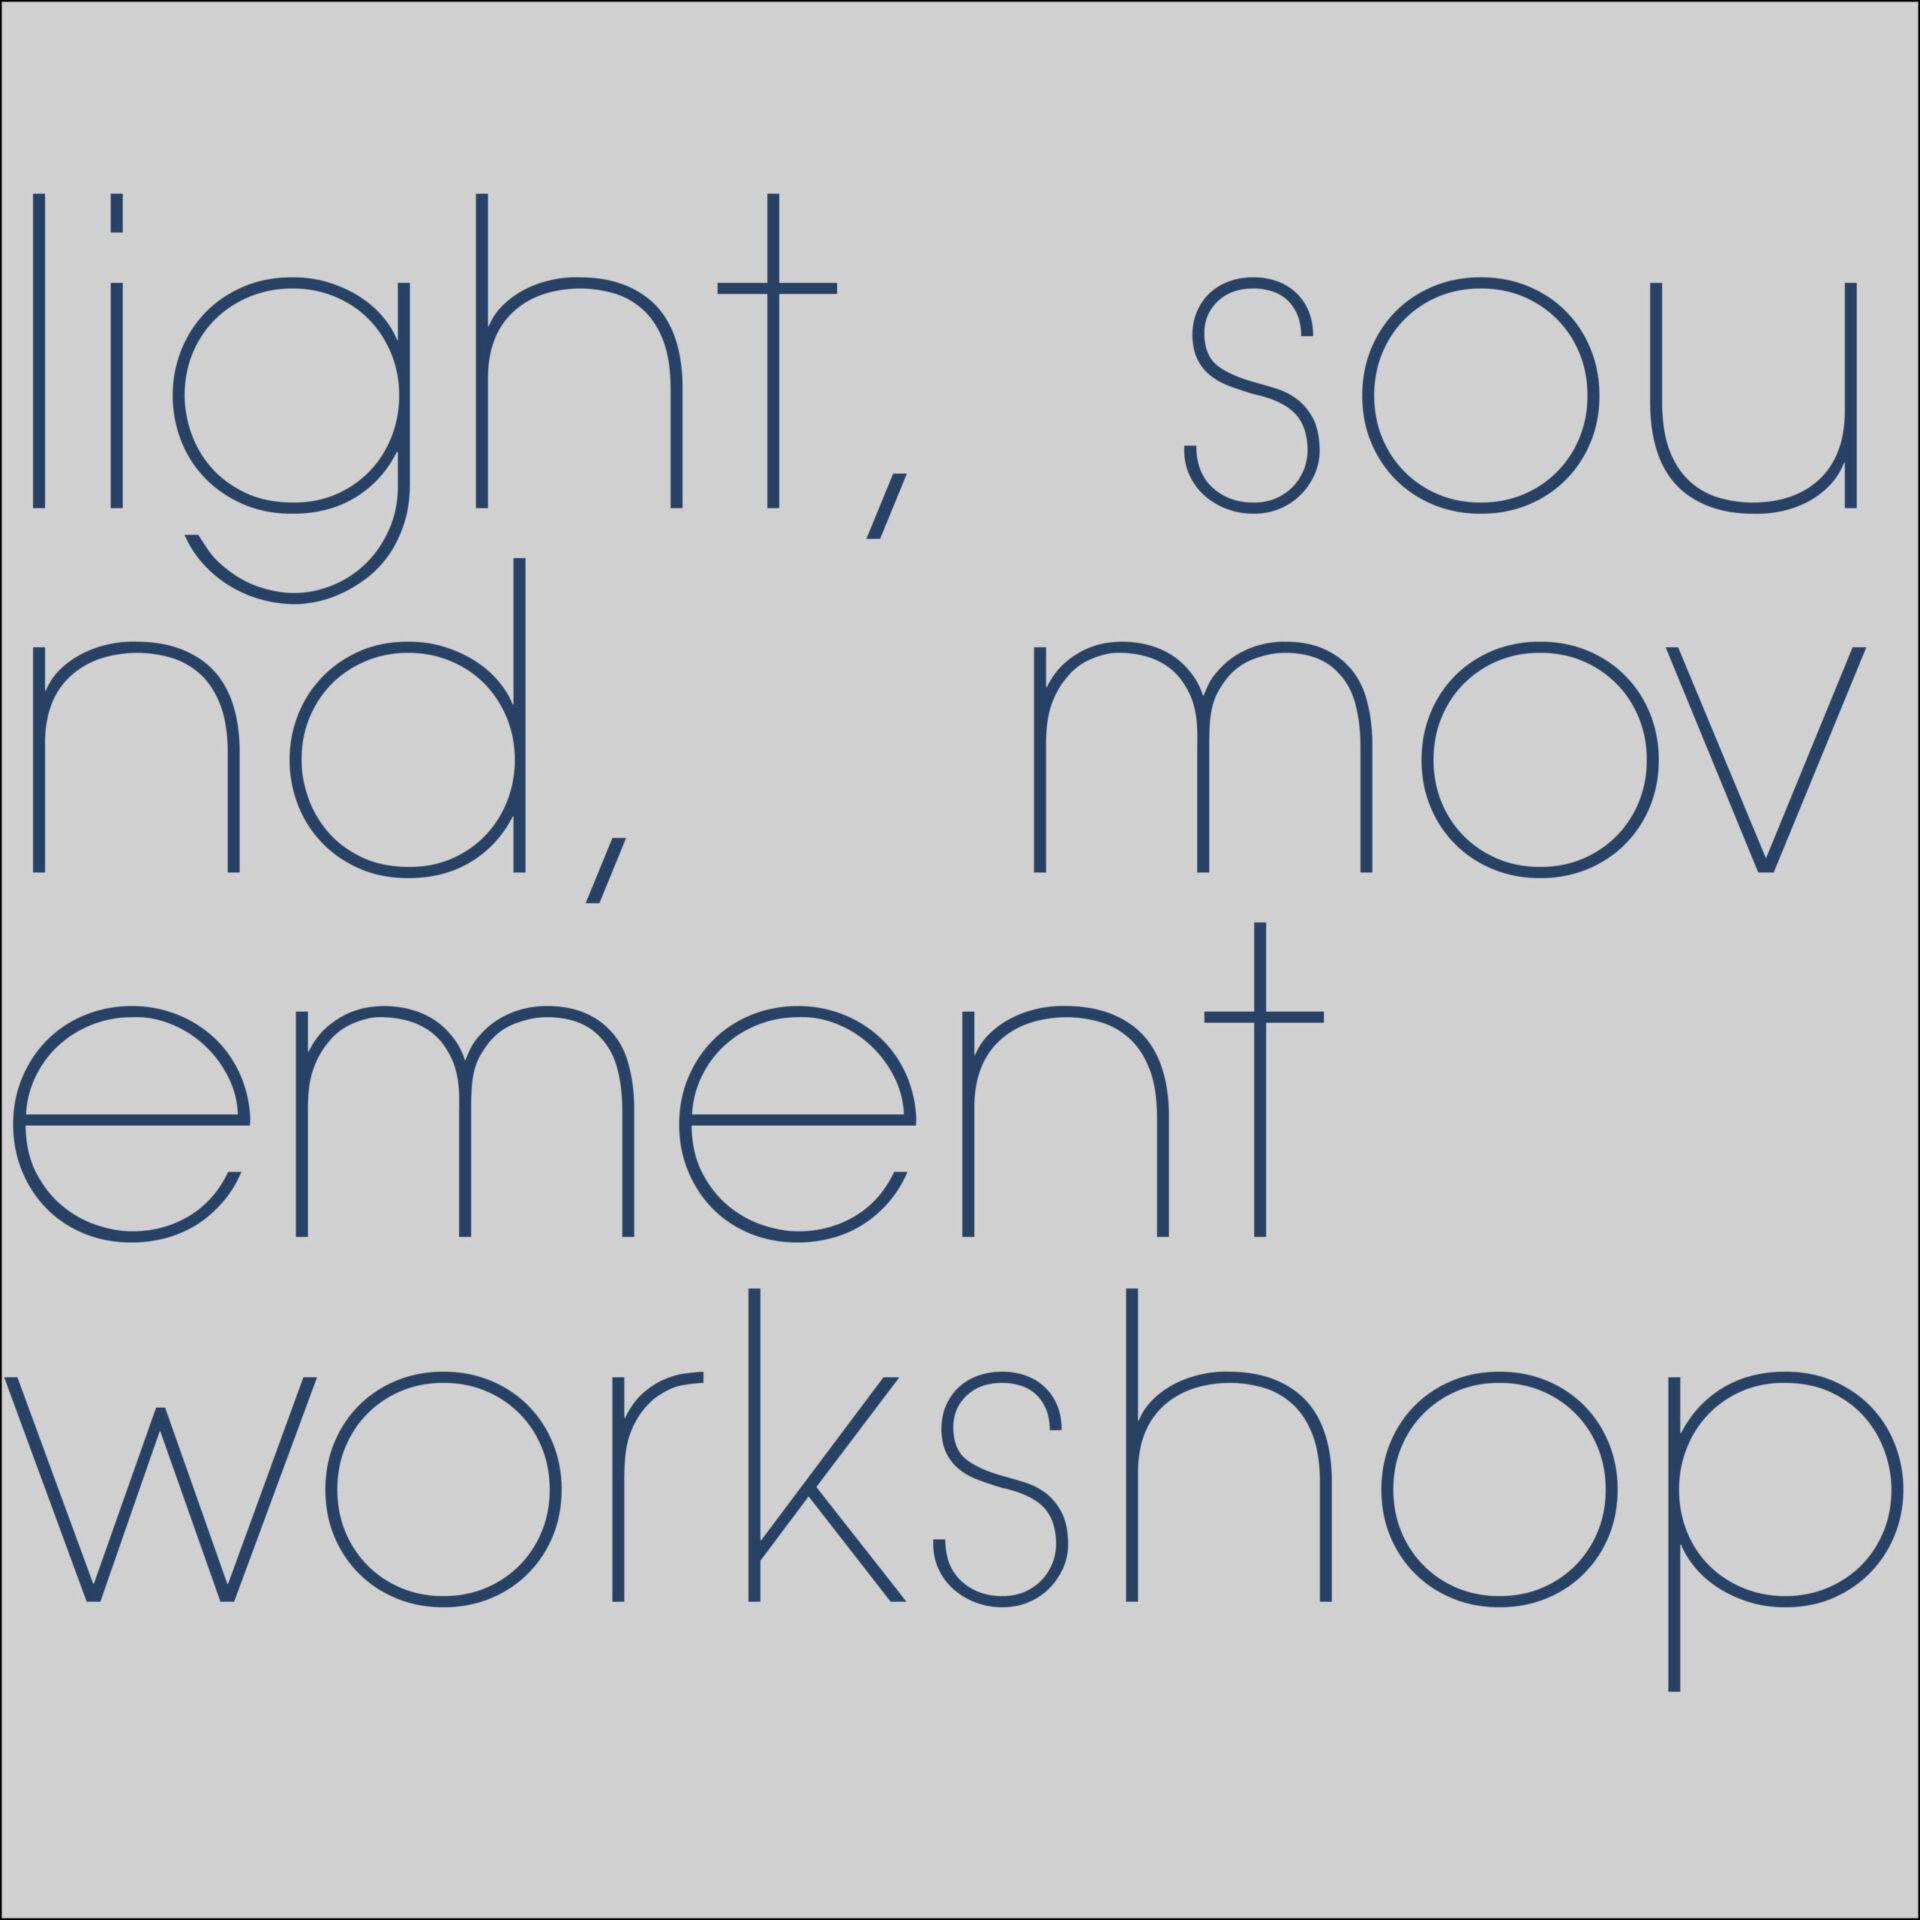 light, sound, movement workshop